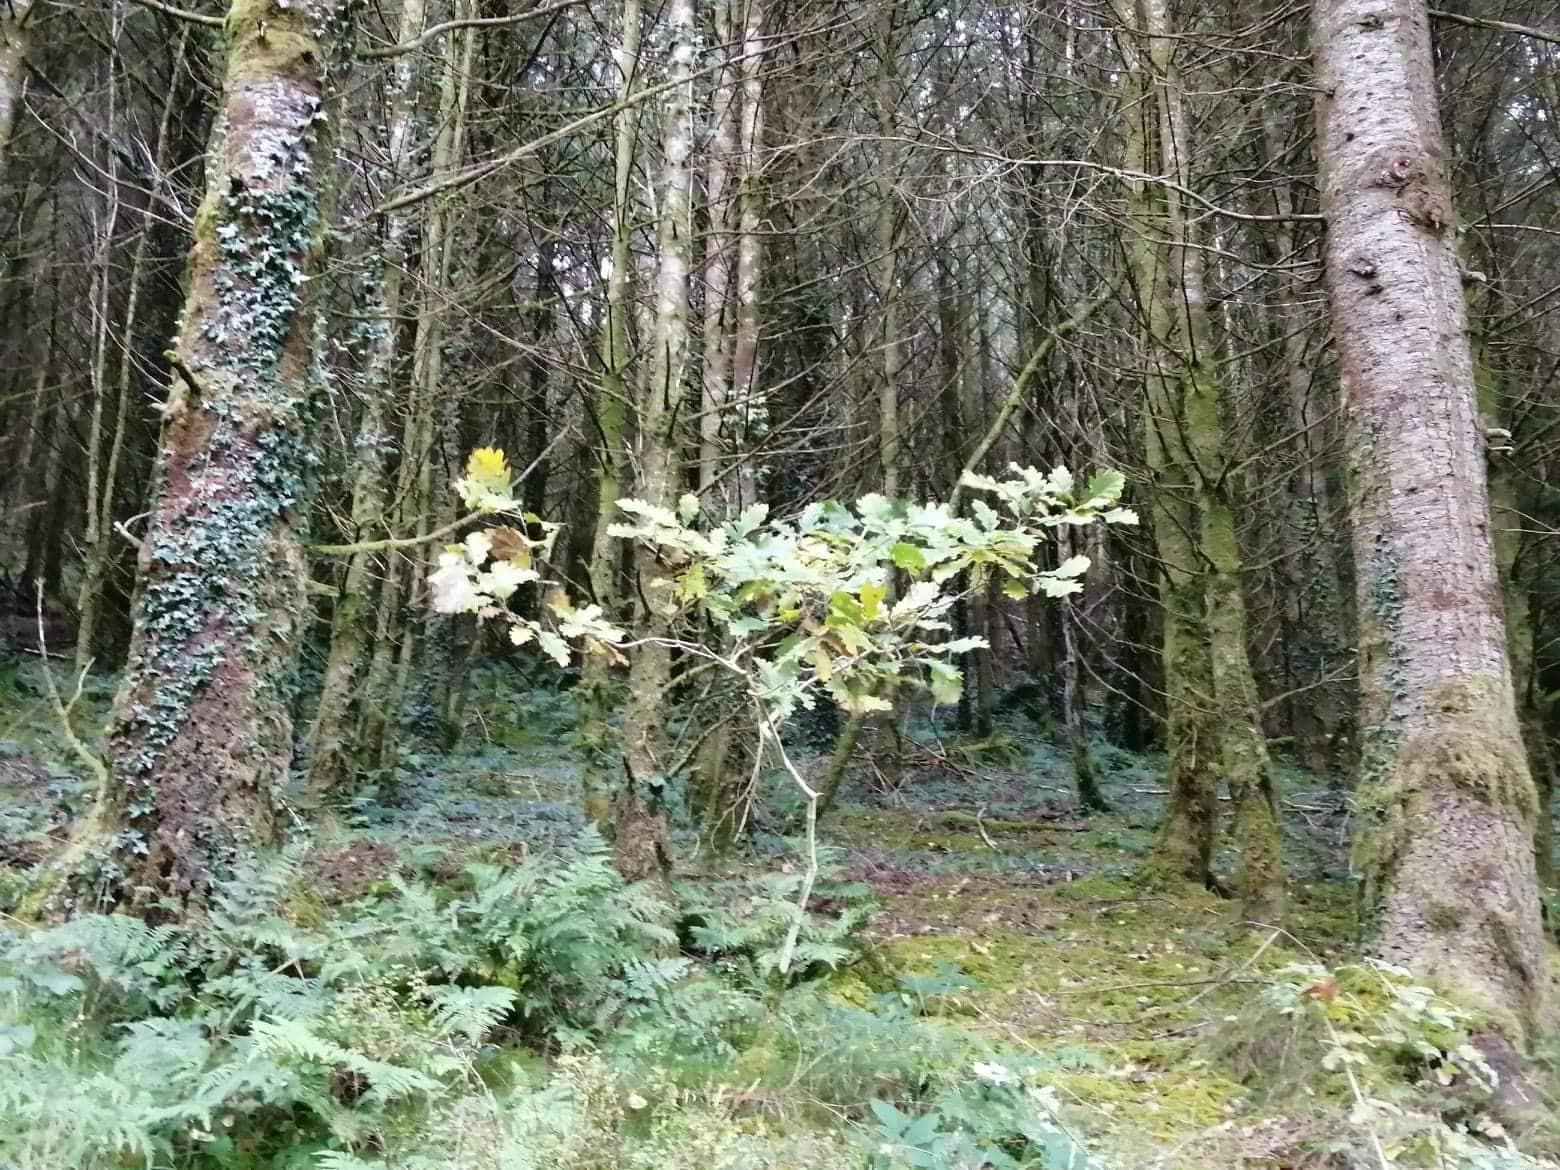 Young Oak, Abergorlech, Brechfa Forest, Wales